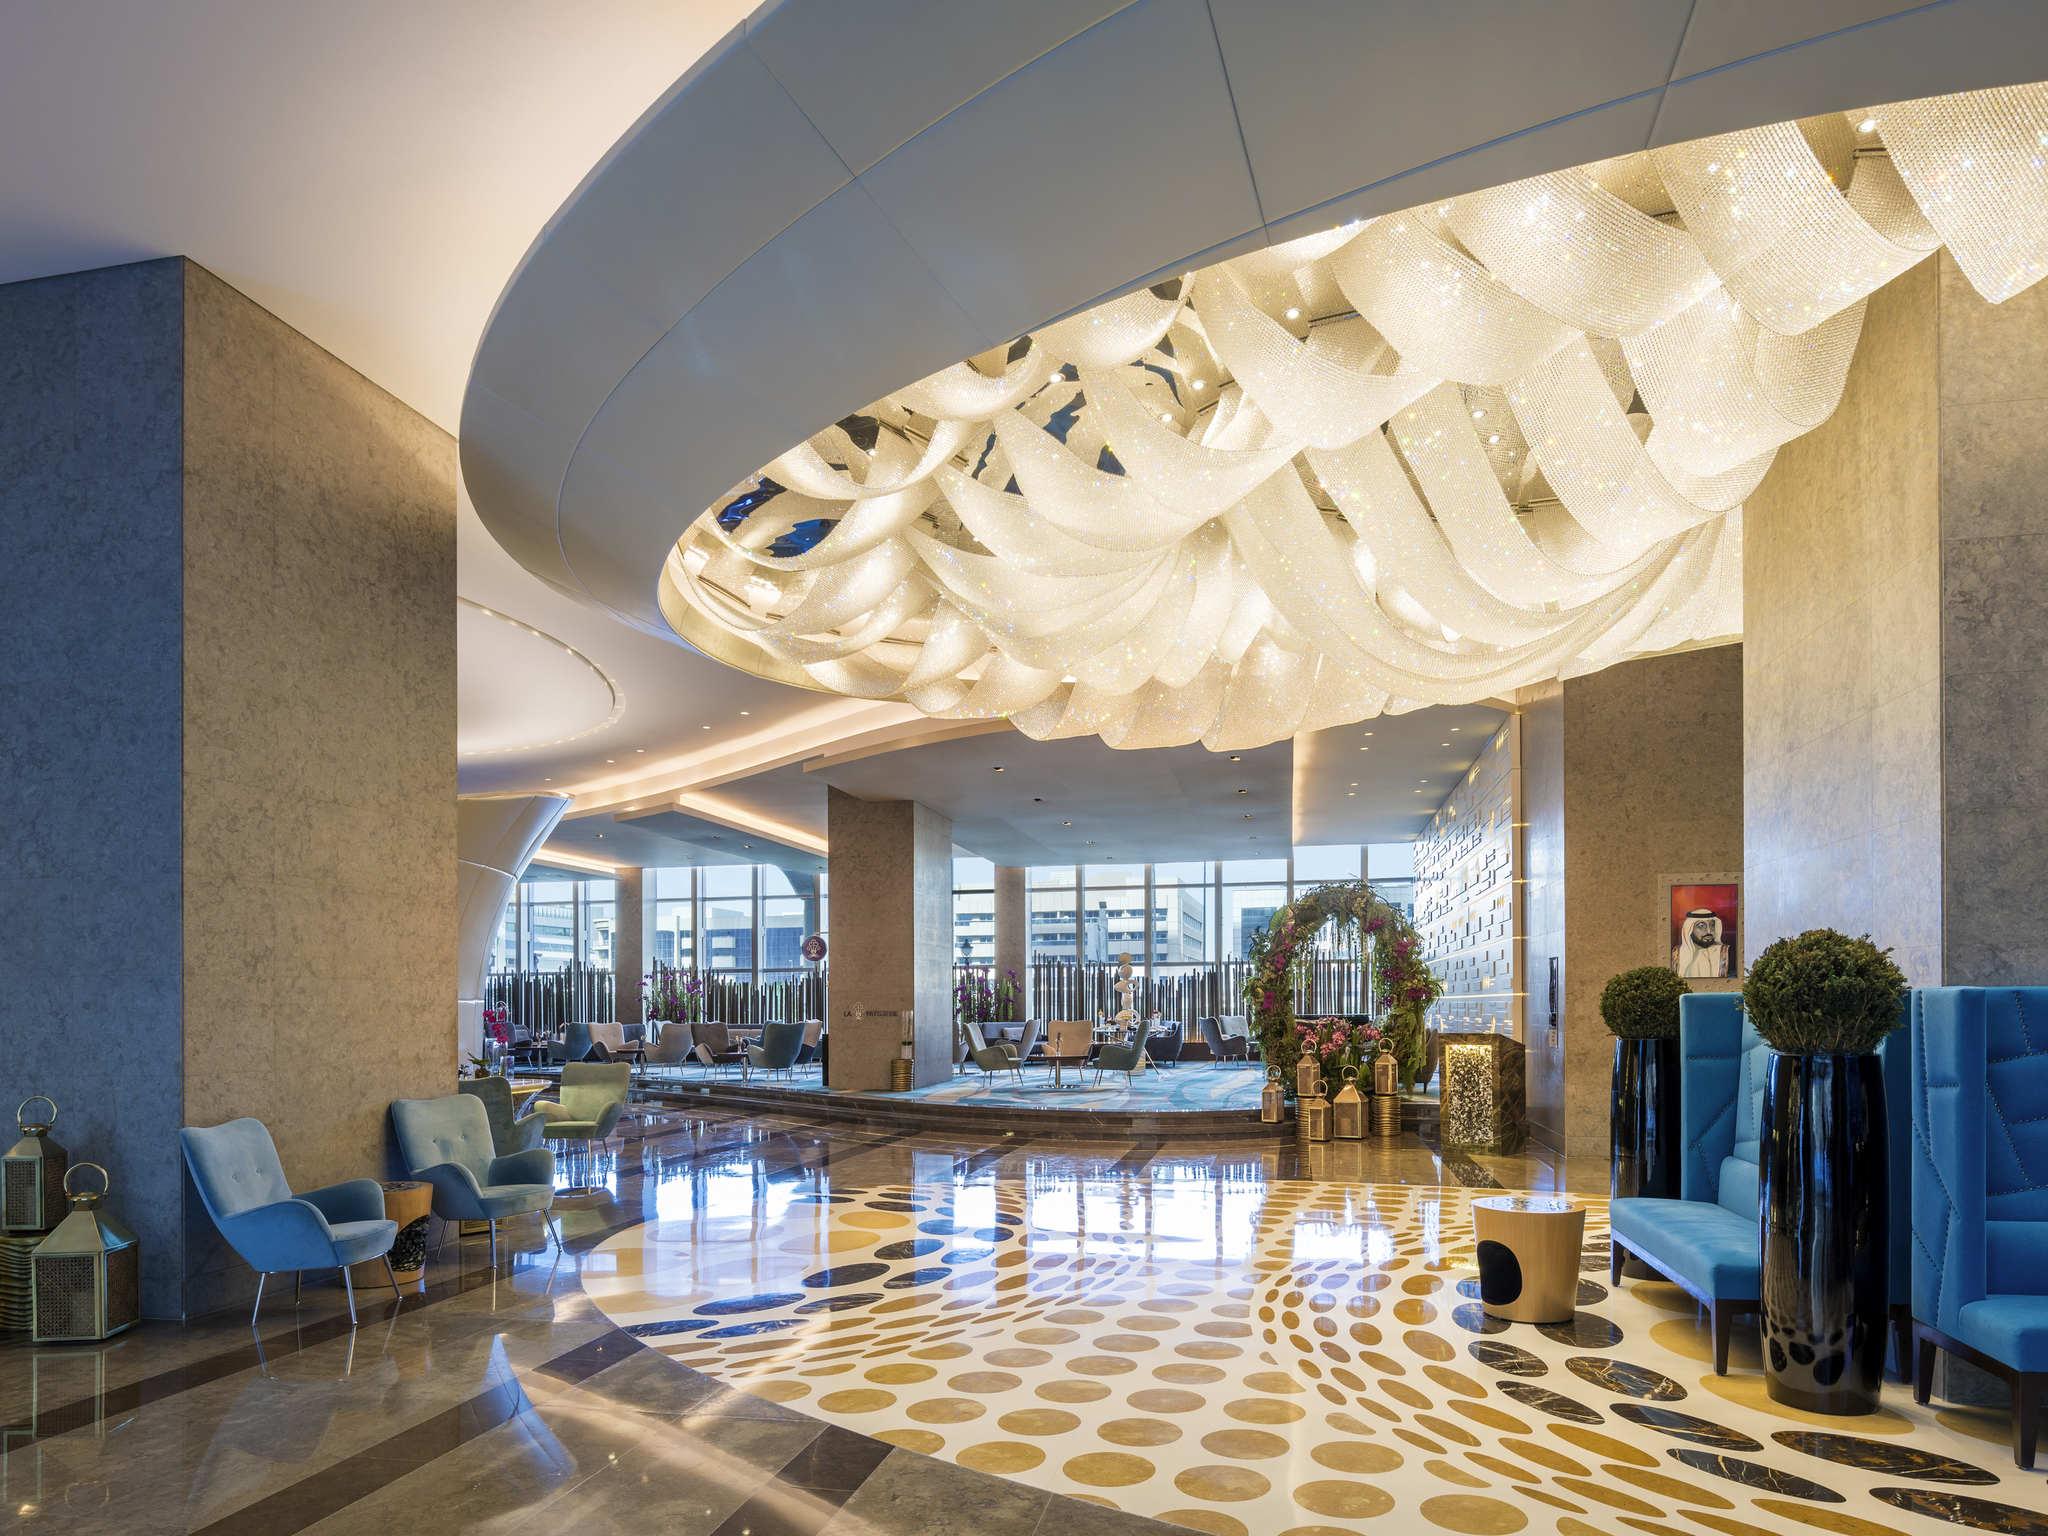 Hotel in DUBAI - Sofitel Dubai Downtown near Burj Khalifa